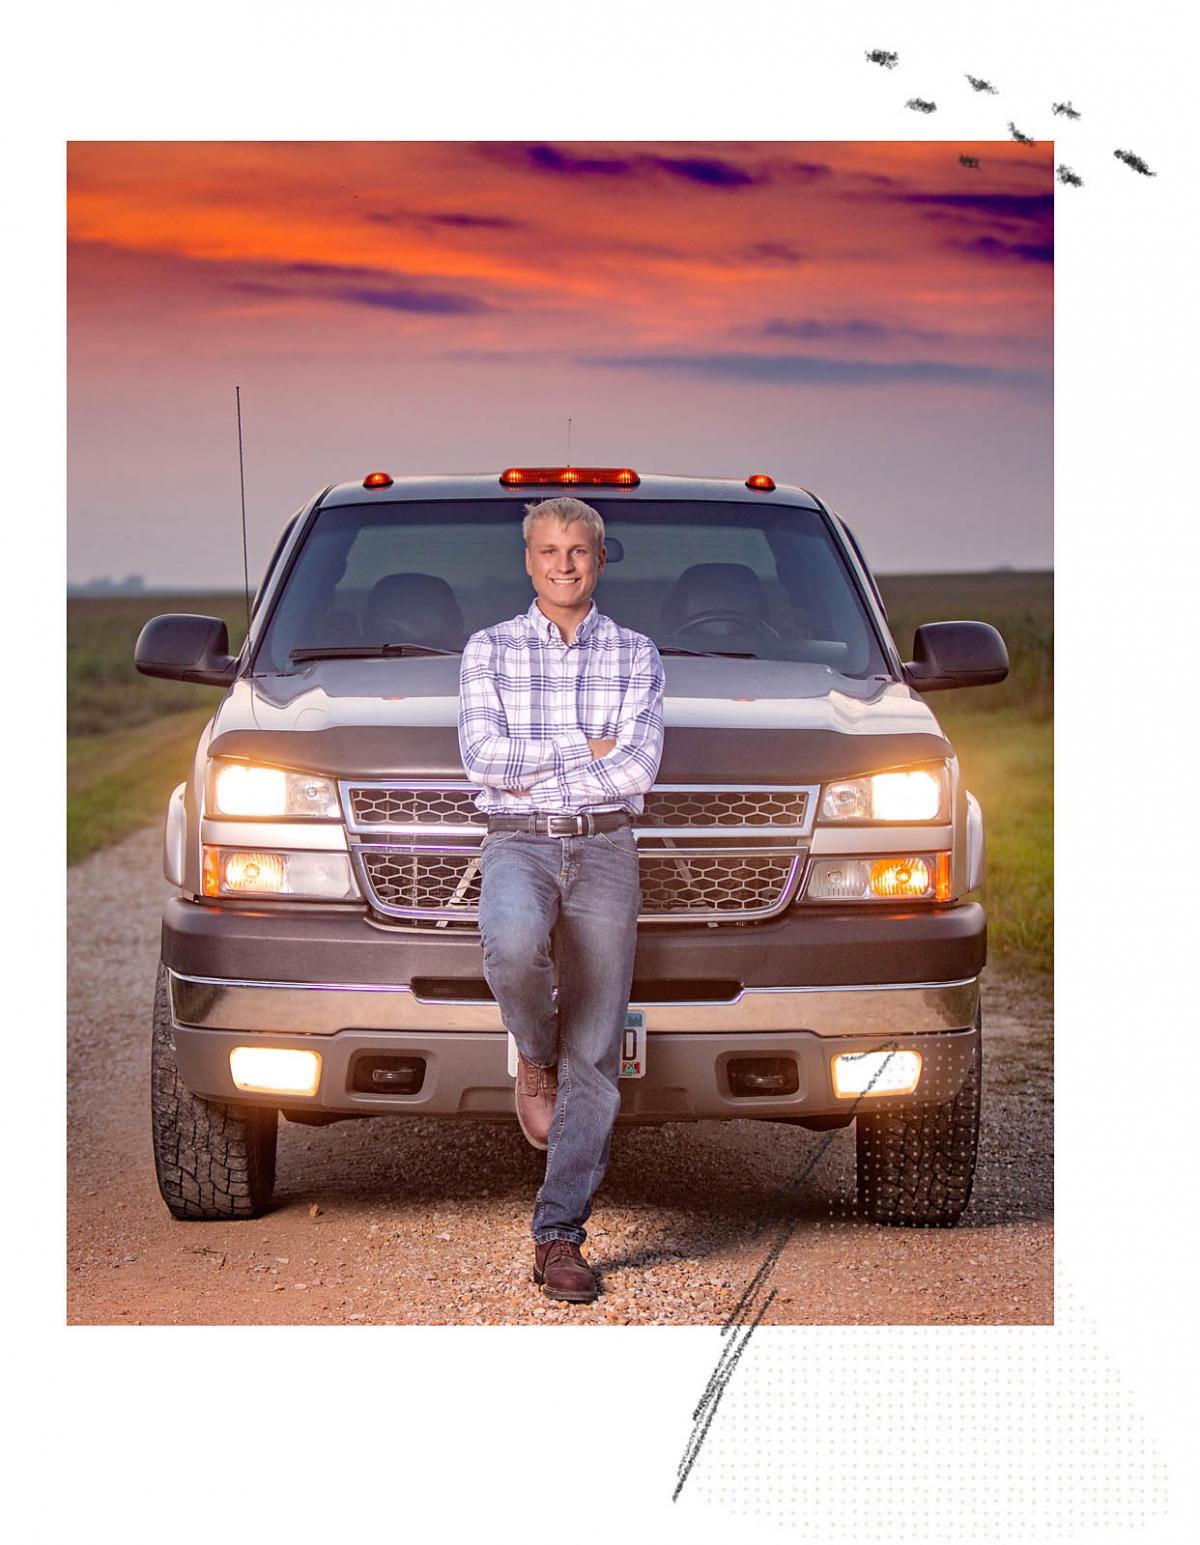 high school senior boy leaning on truck on MN gravel road at sunset